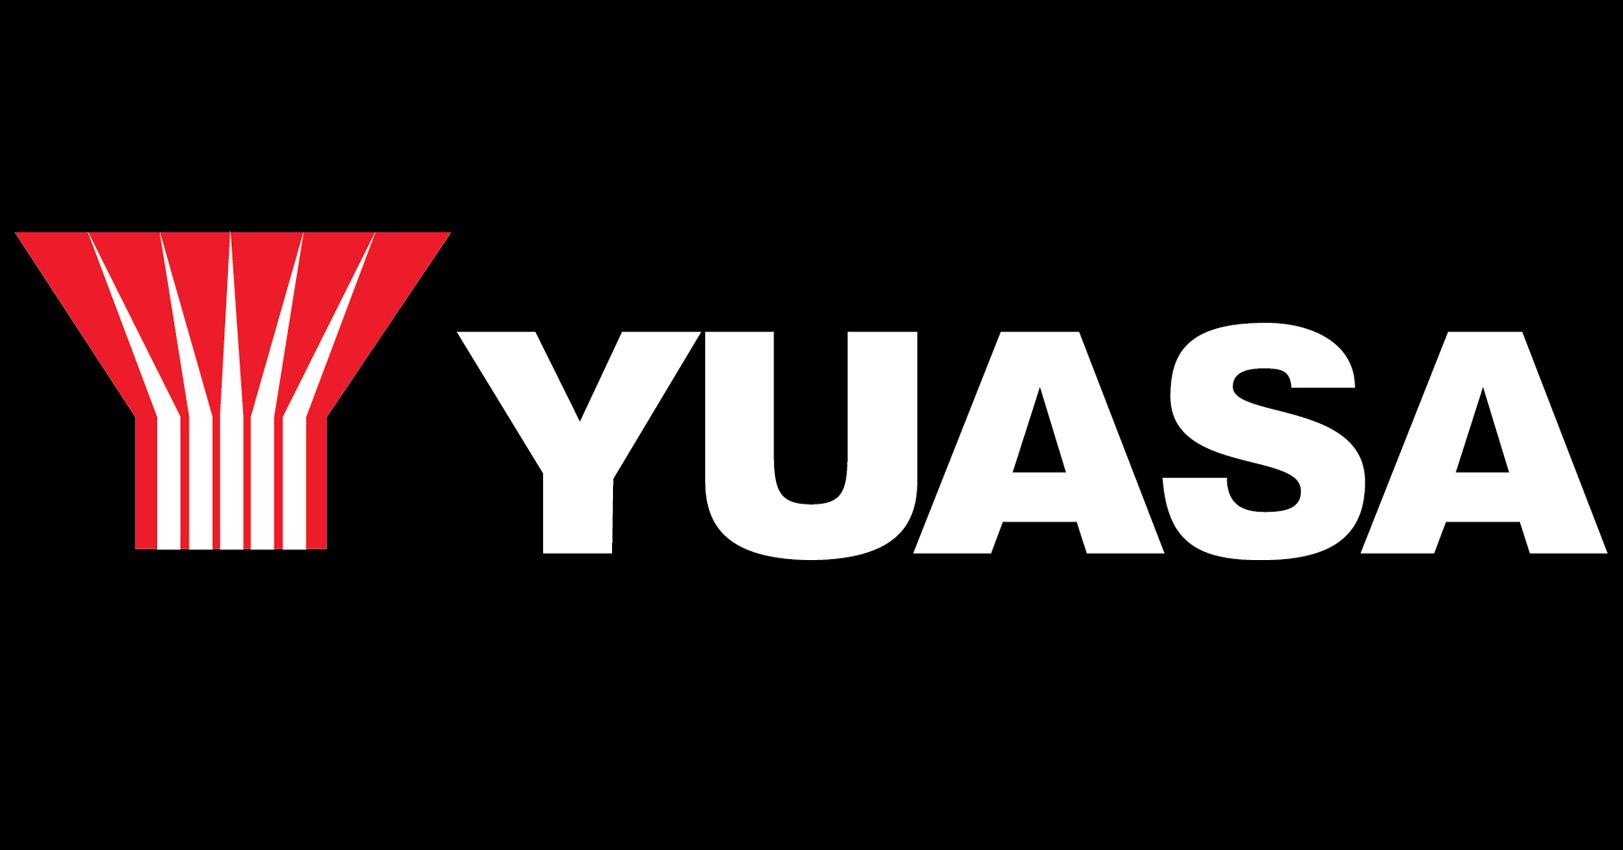 yuasa-social-logo.png